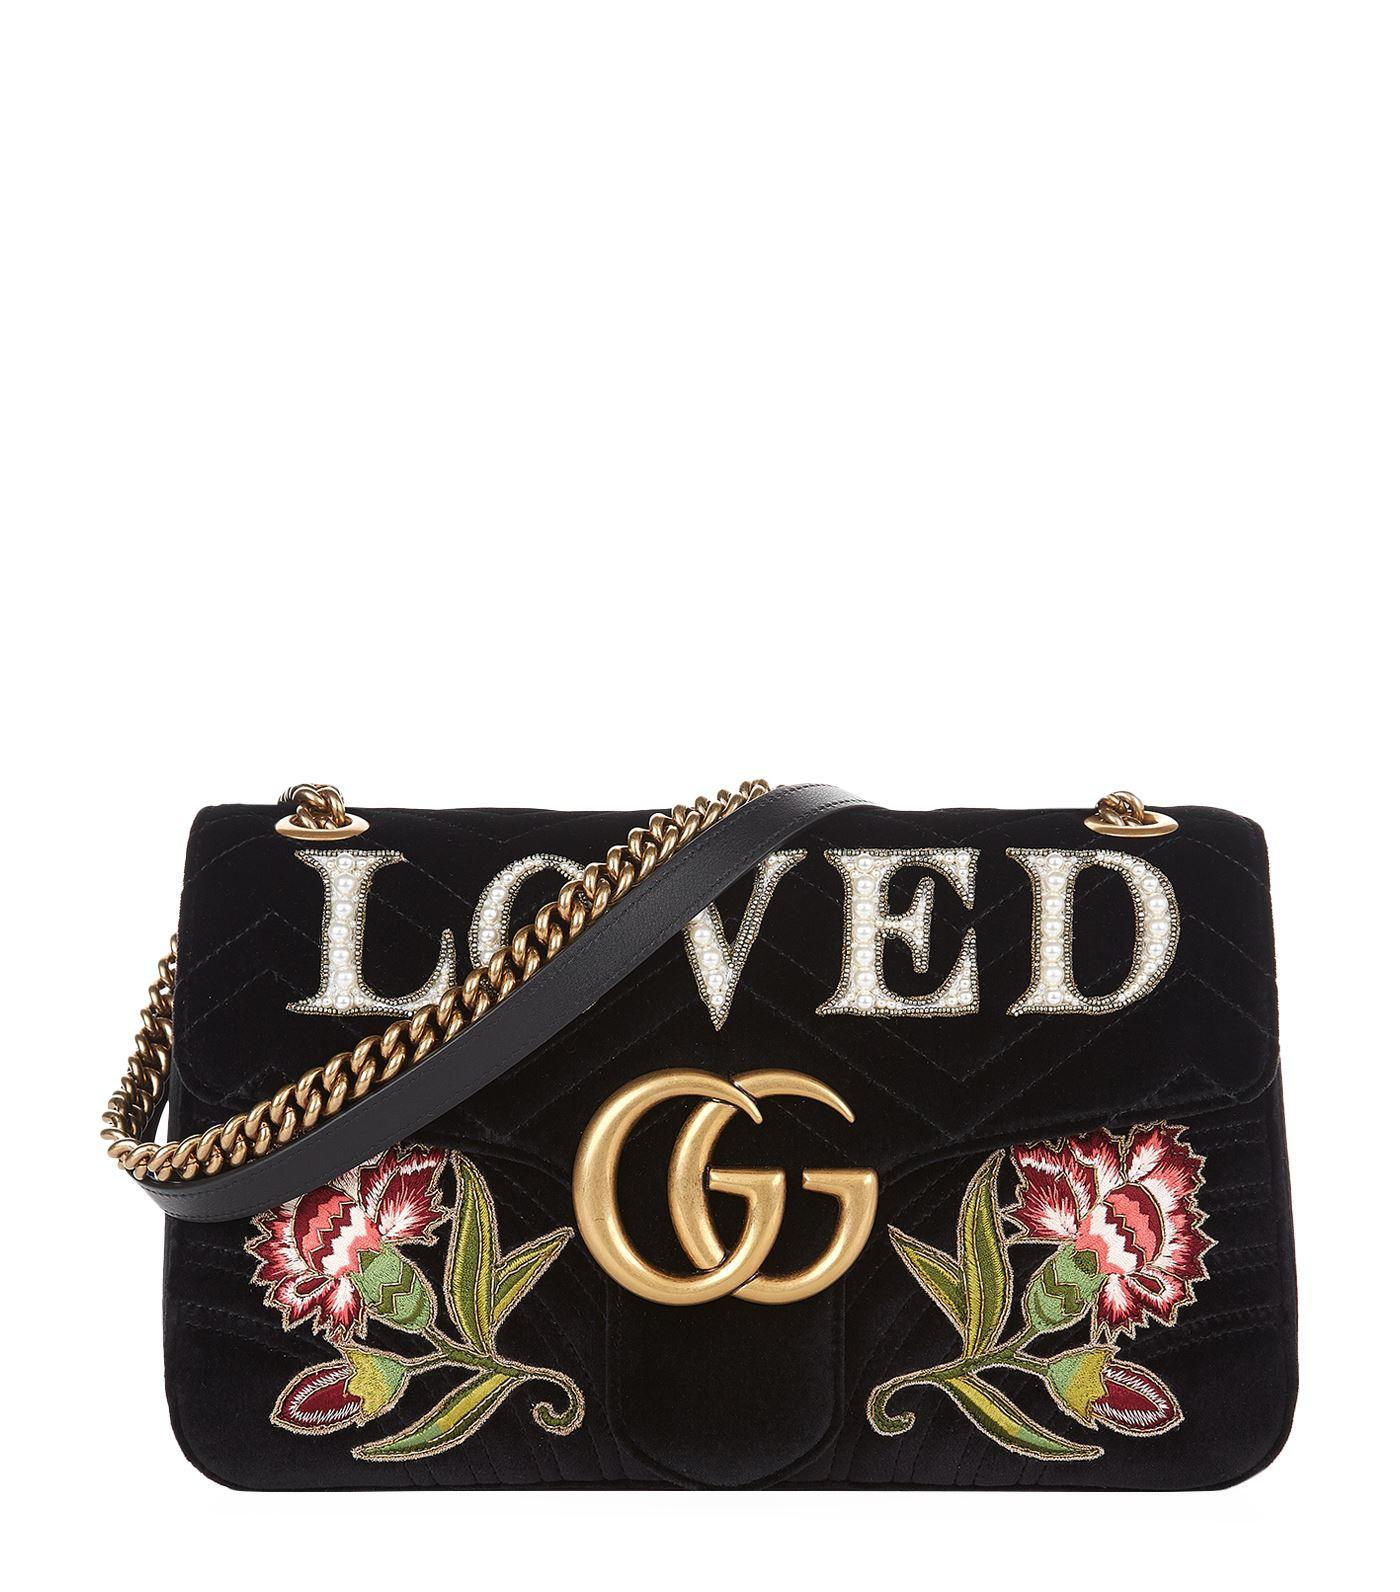 b178066a451 Gucci Gg Marmont Medium Embroidered MatelassÉ Velvet Shoulder Bag In ...